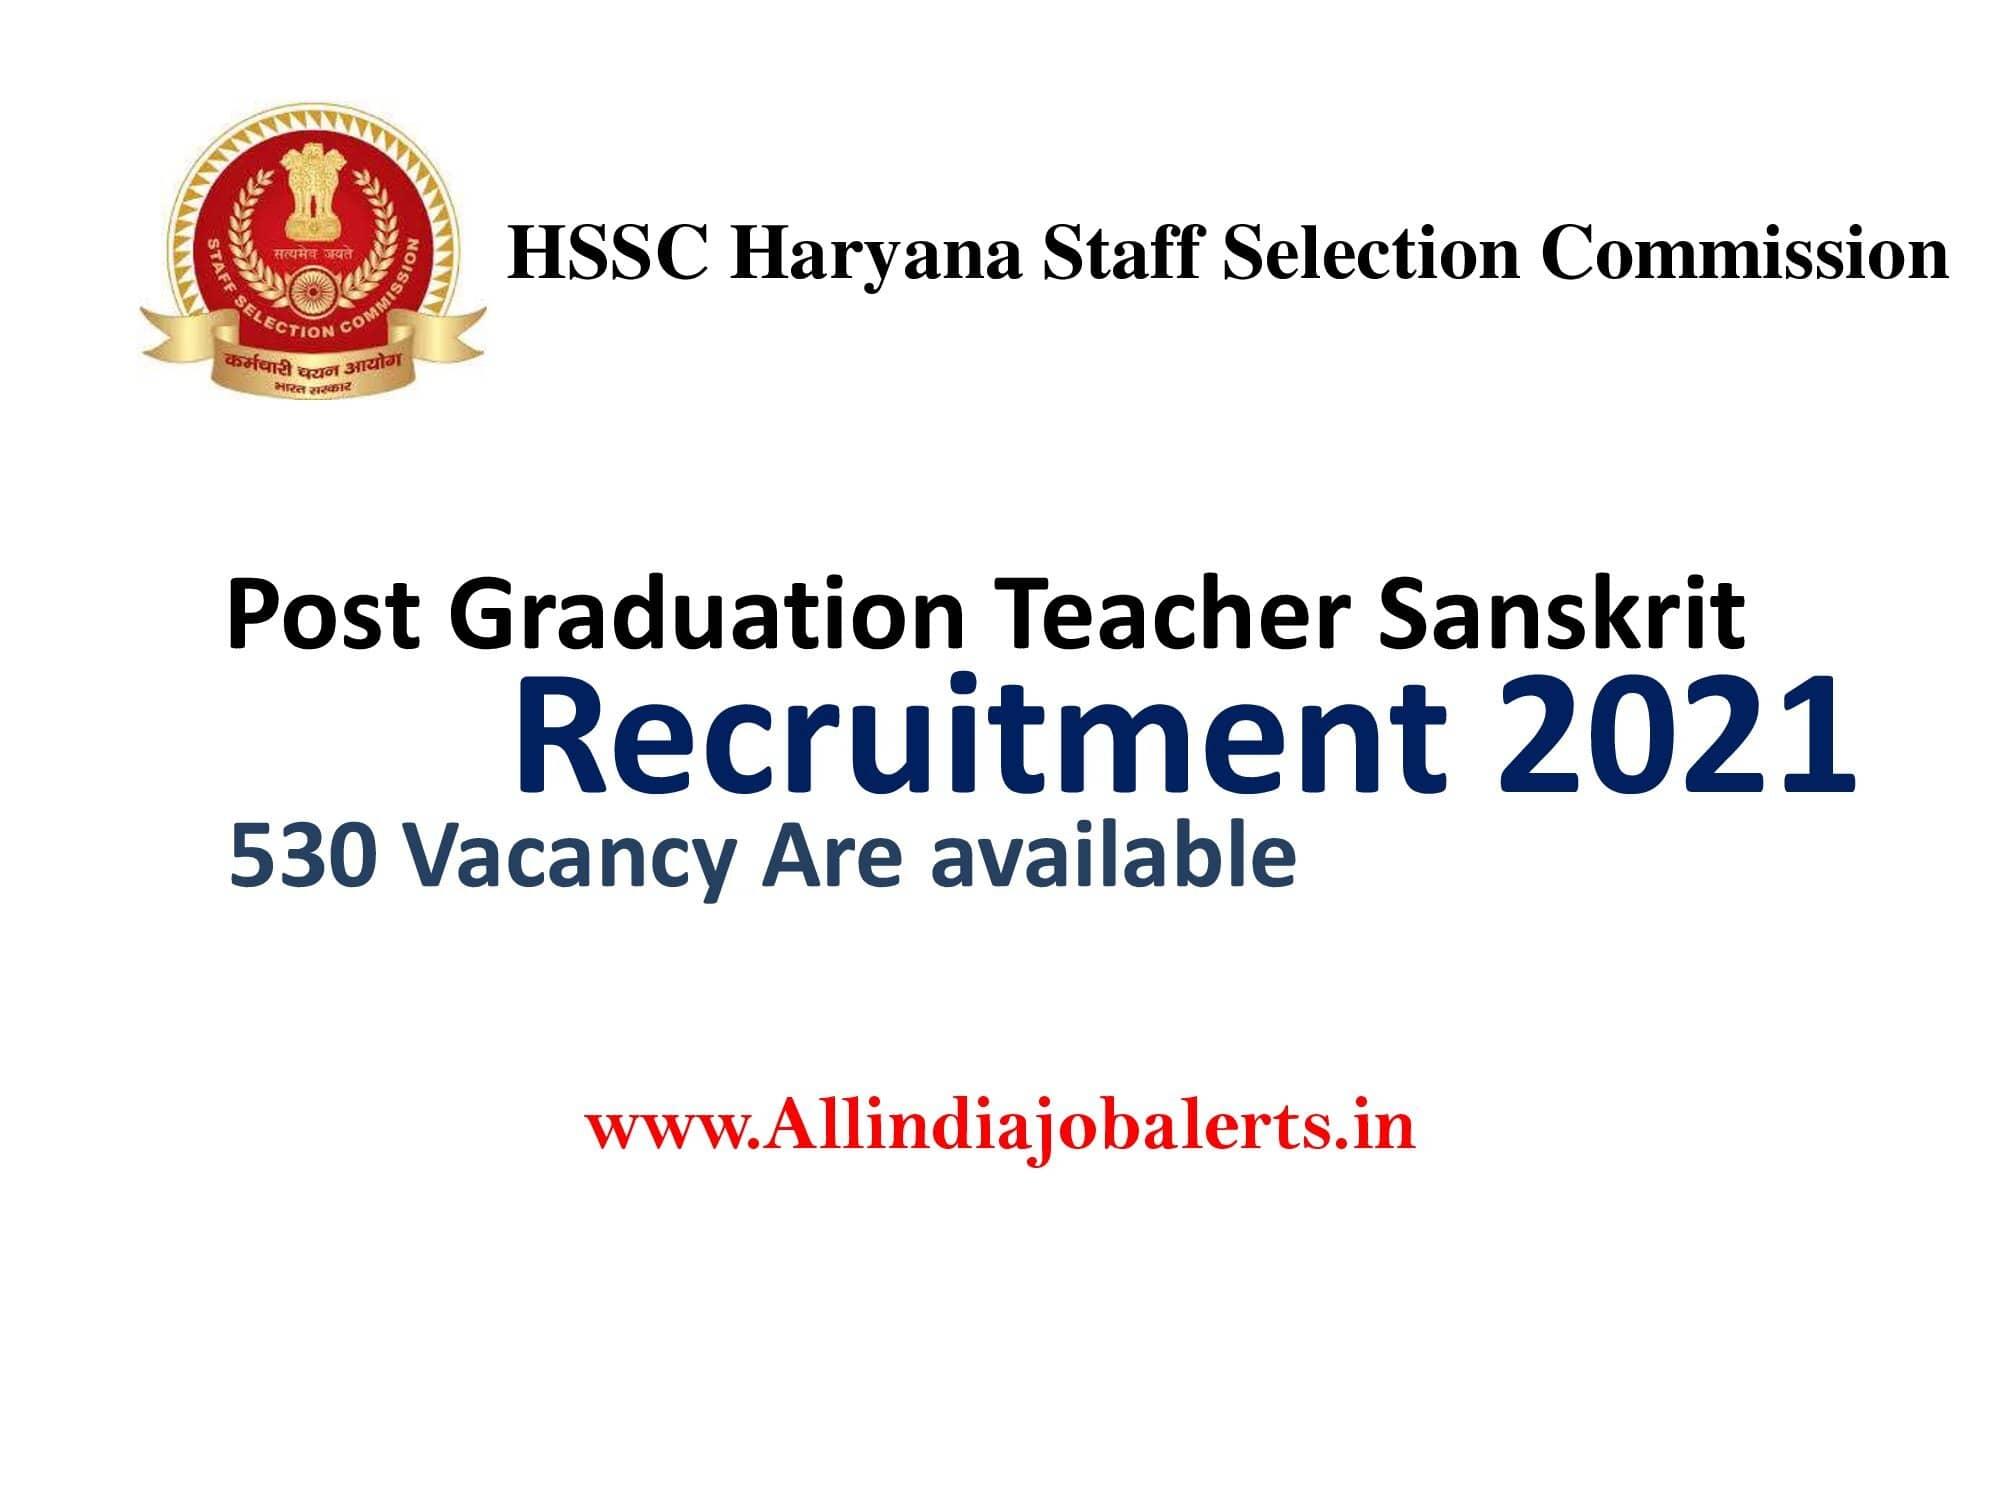 Govt Jobs in Haryana 2021, Haryana Staff Selection Commission HSSC Recruitment